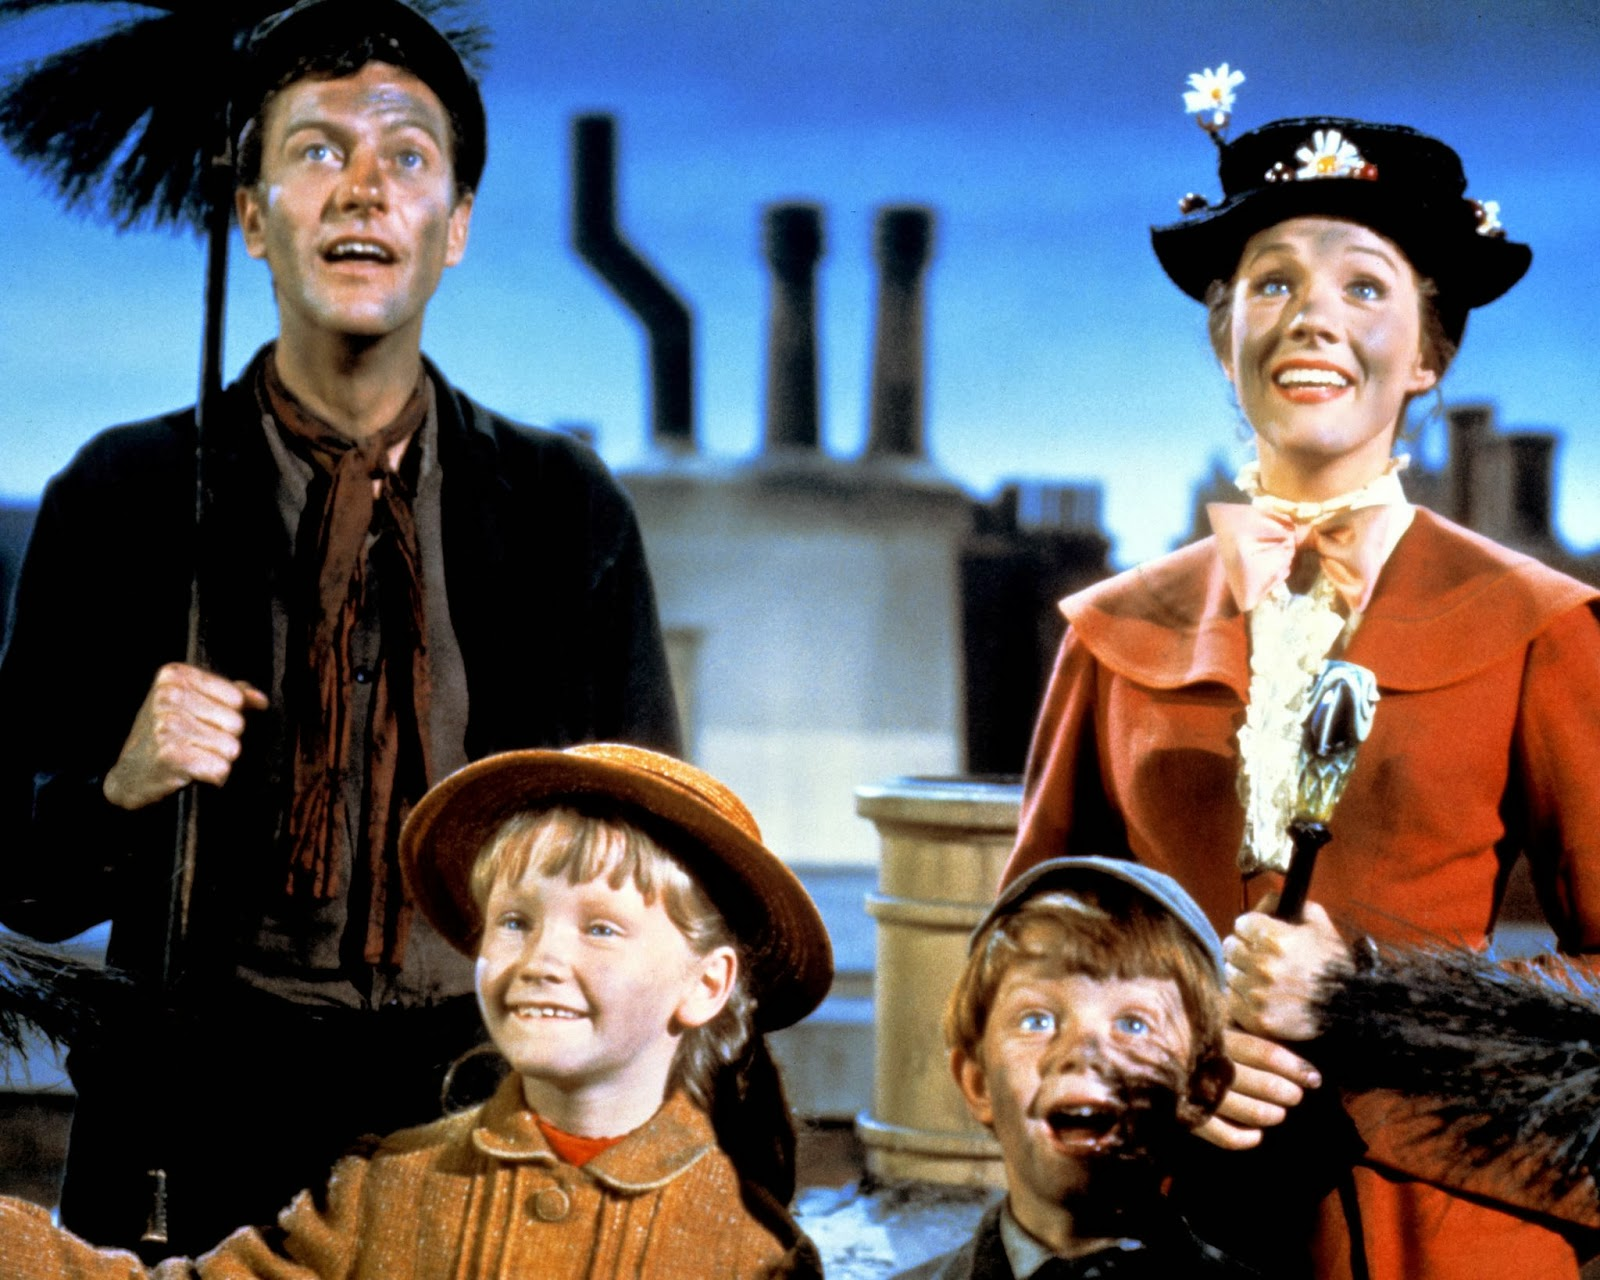 Cinema viaggio nel mondo disney mary poppins